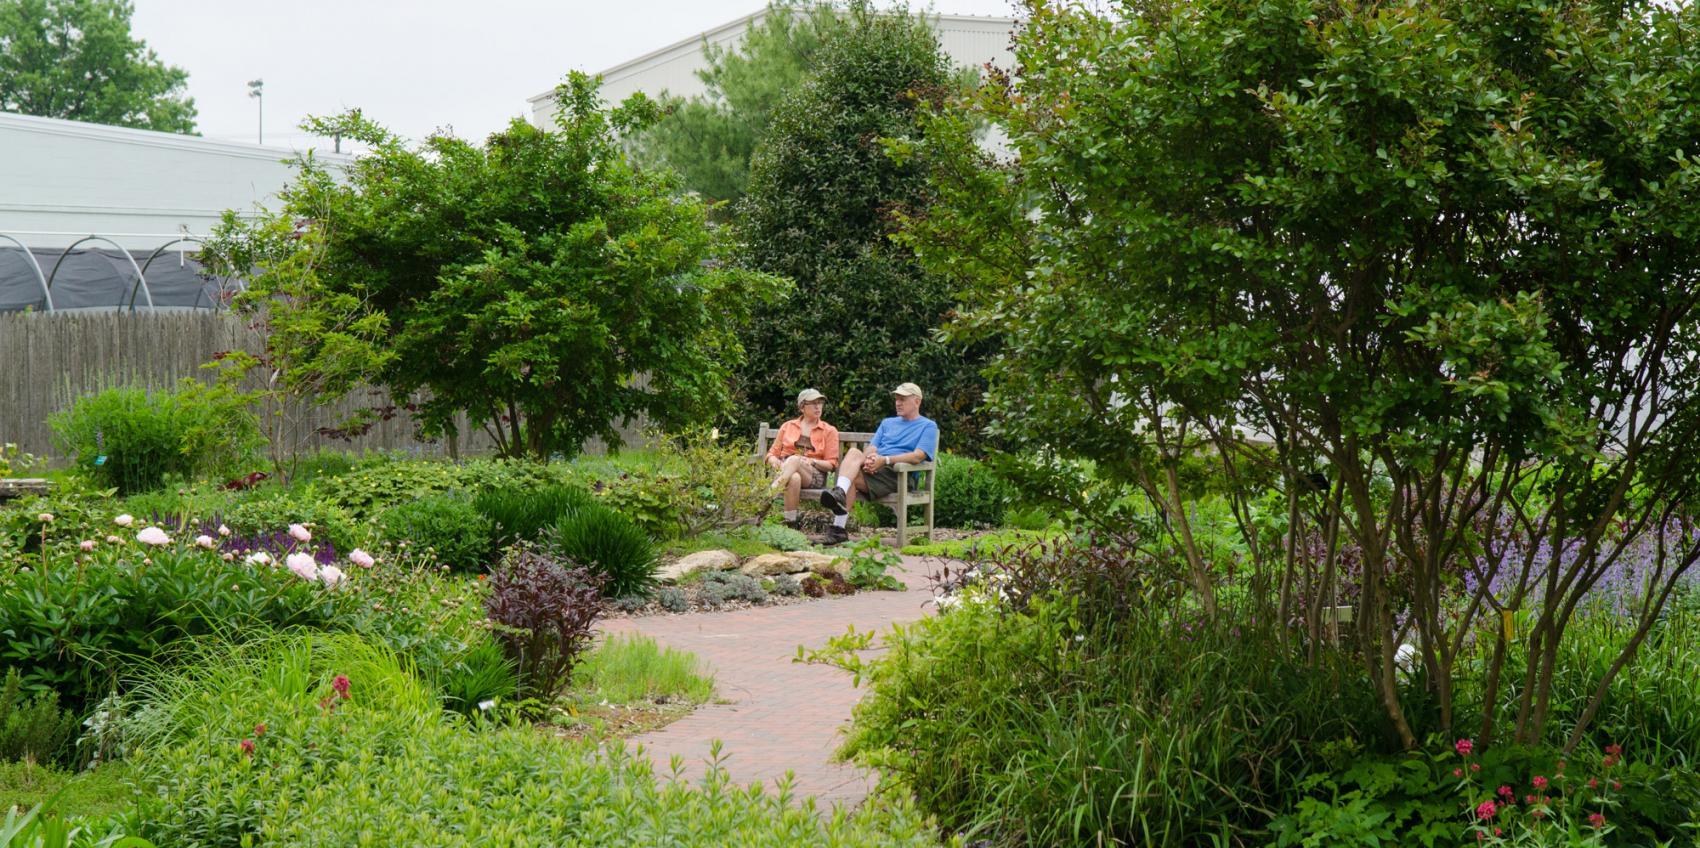 University Of Delaware Botanic Gardens American Public Gardens Association